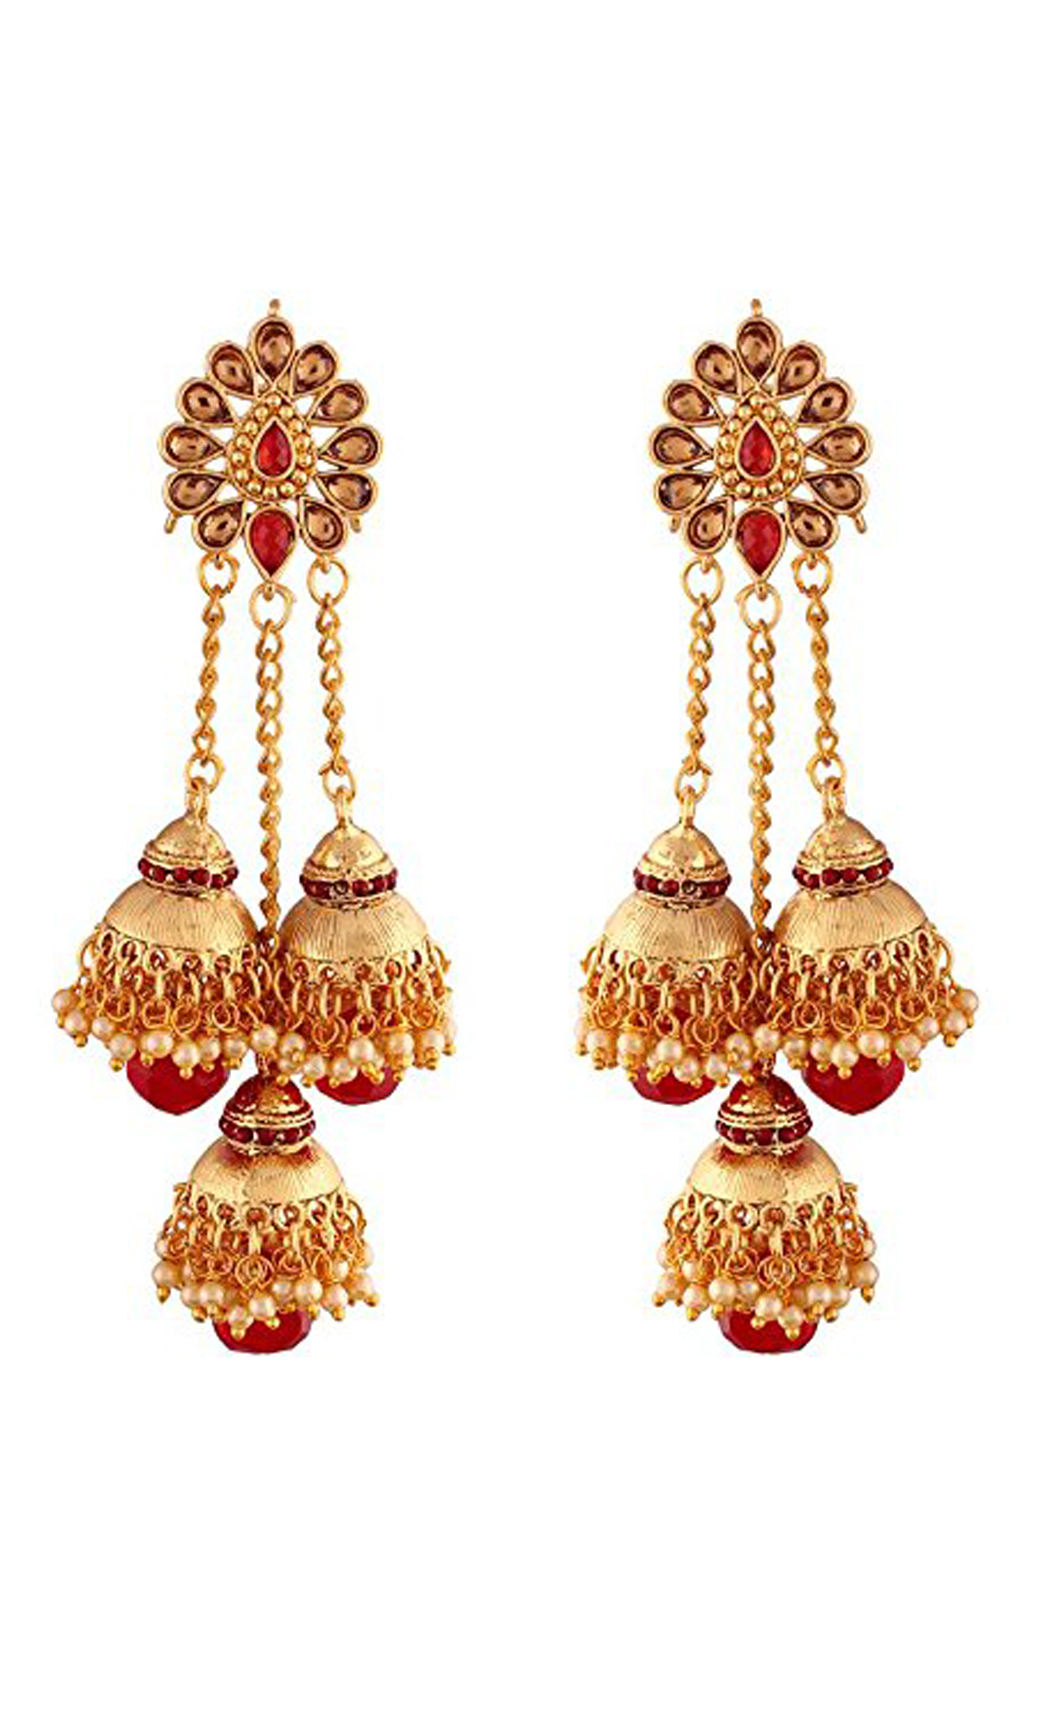 Gold Plated Long Triple Jhumka Earrings | Wedding Earrings |Buy Online